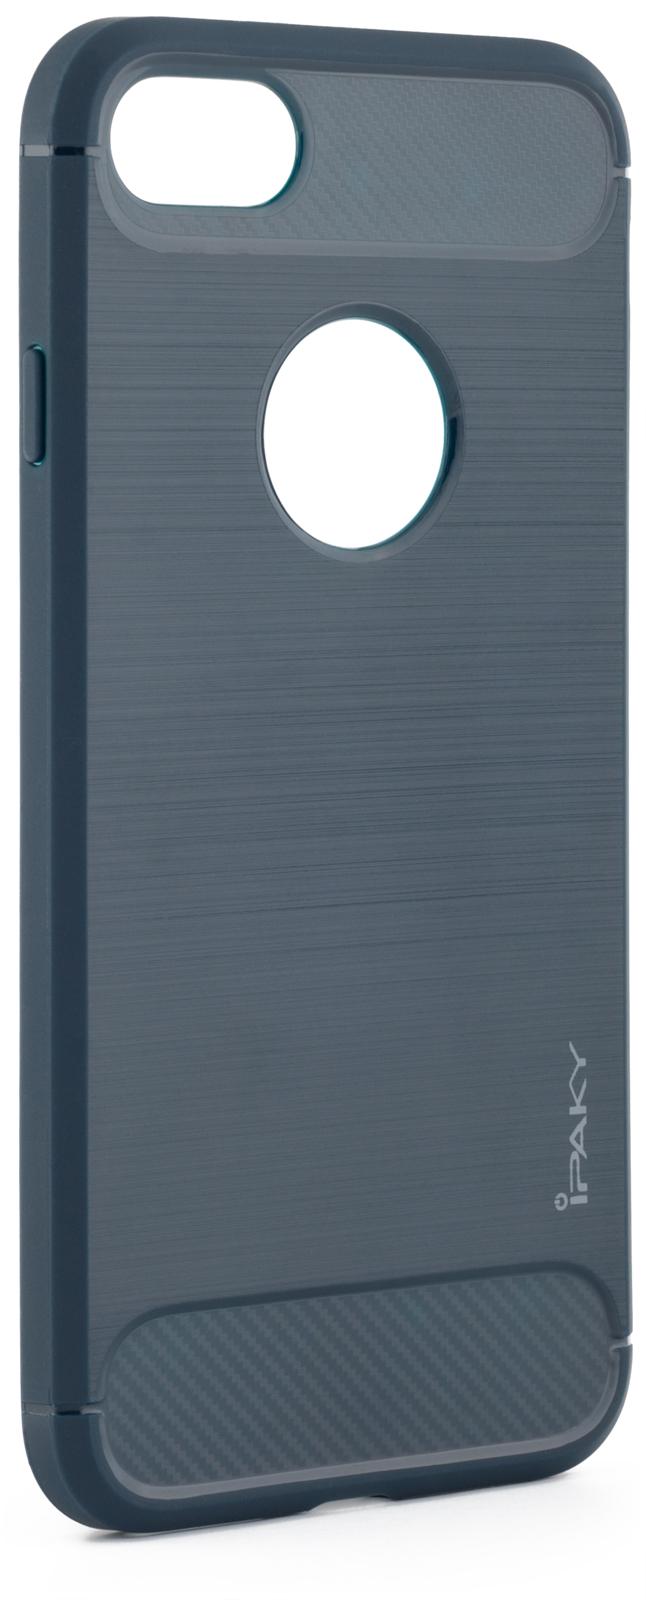 Купить Чохол iPaky для iPhone 7 - slim TPU cиній, iPaky Iphone 7 slim TPU Blue